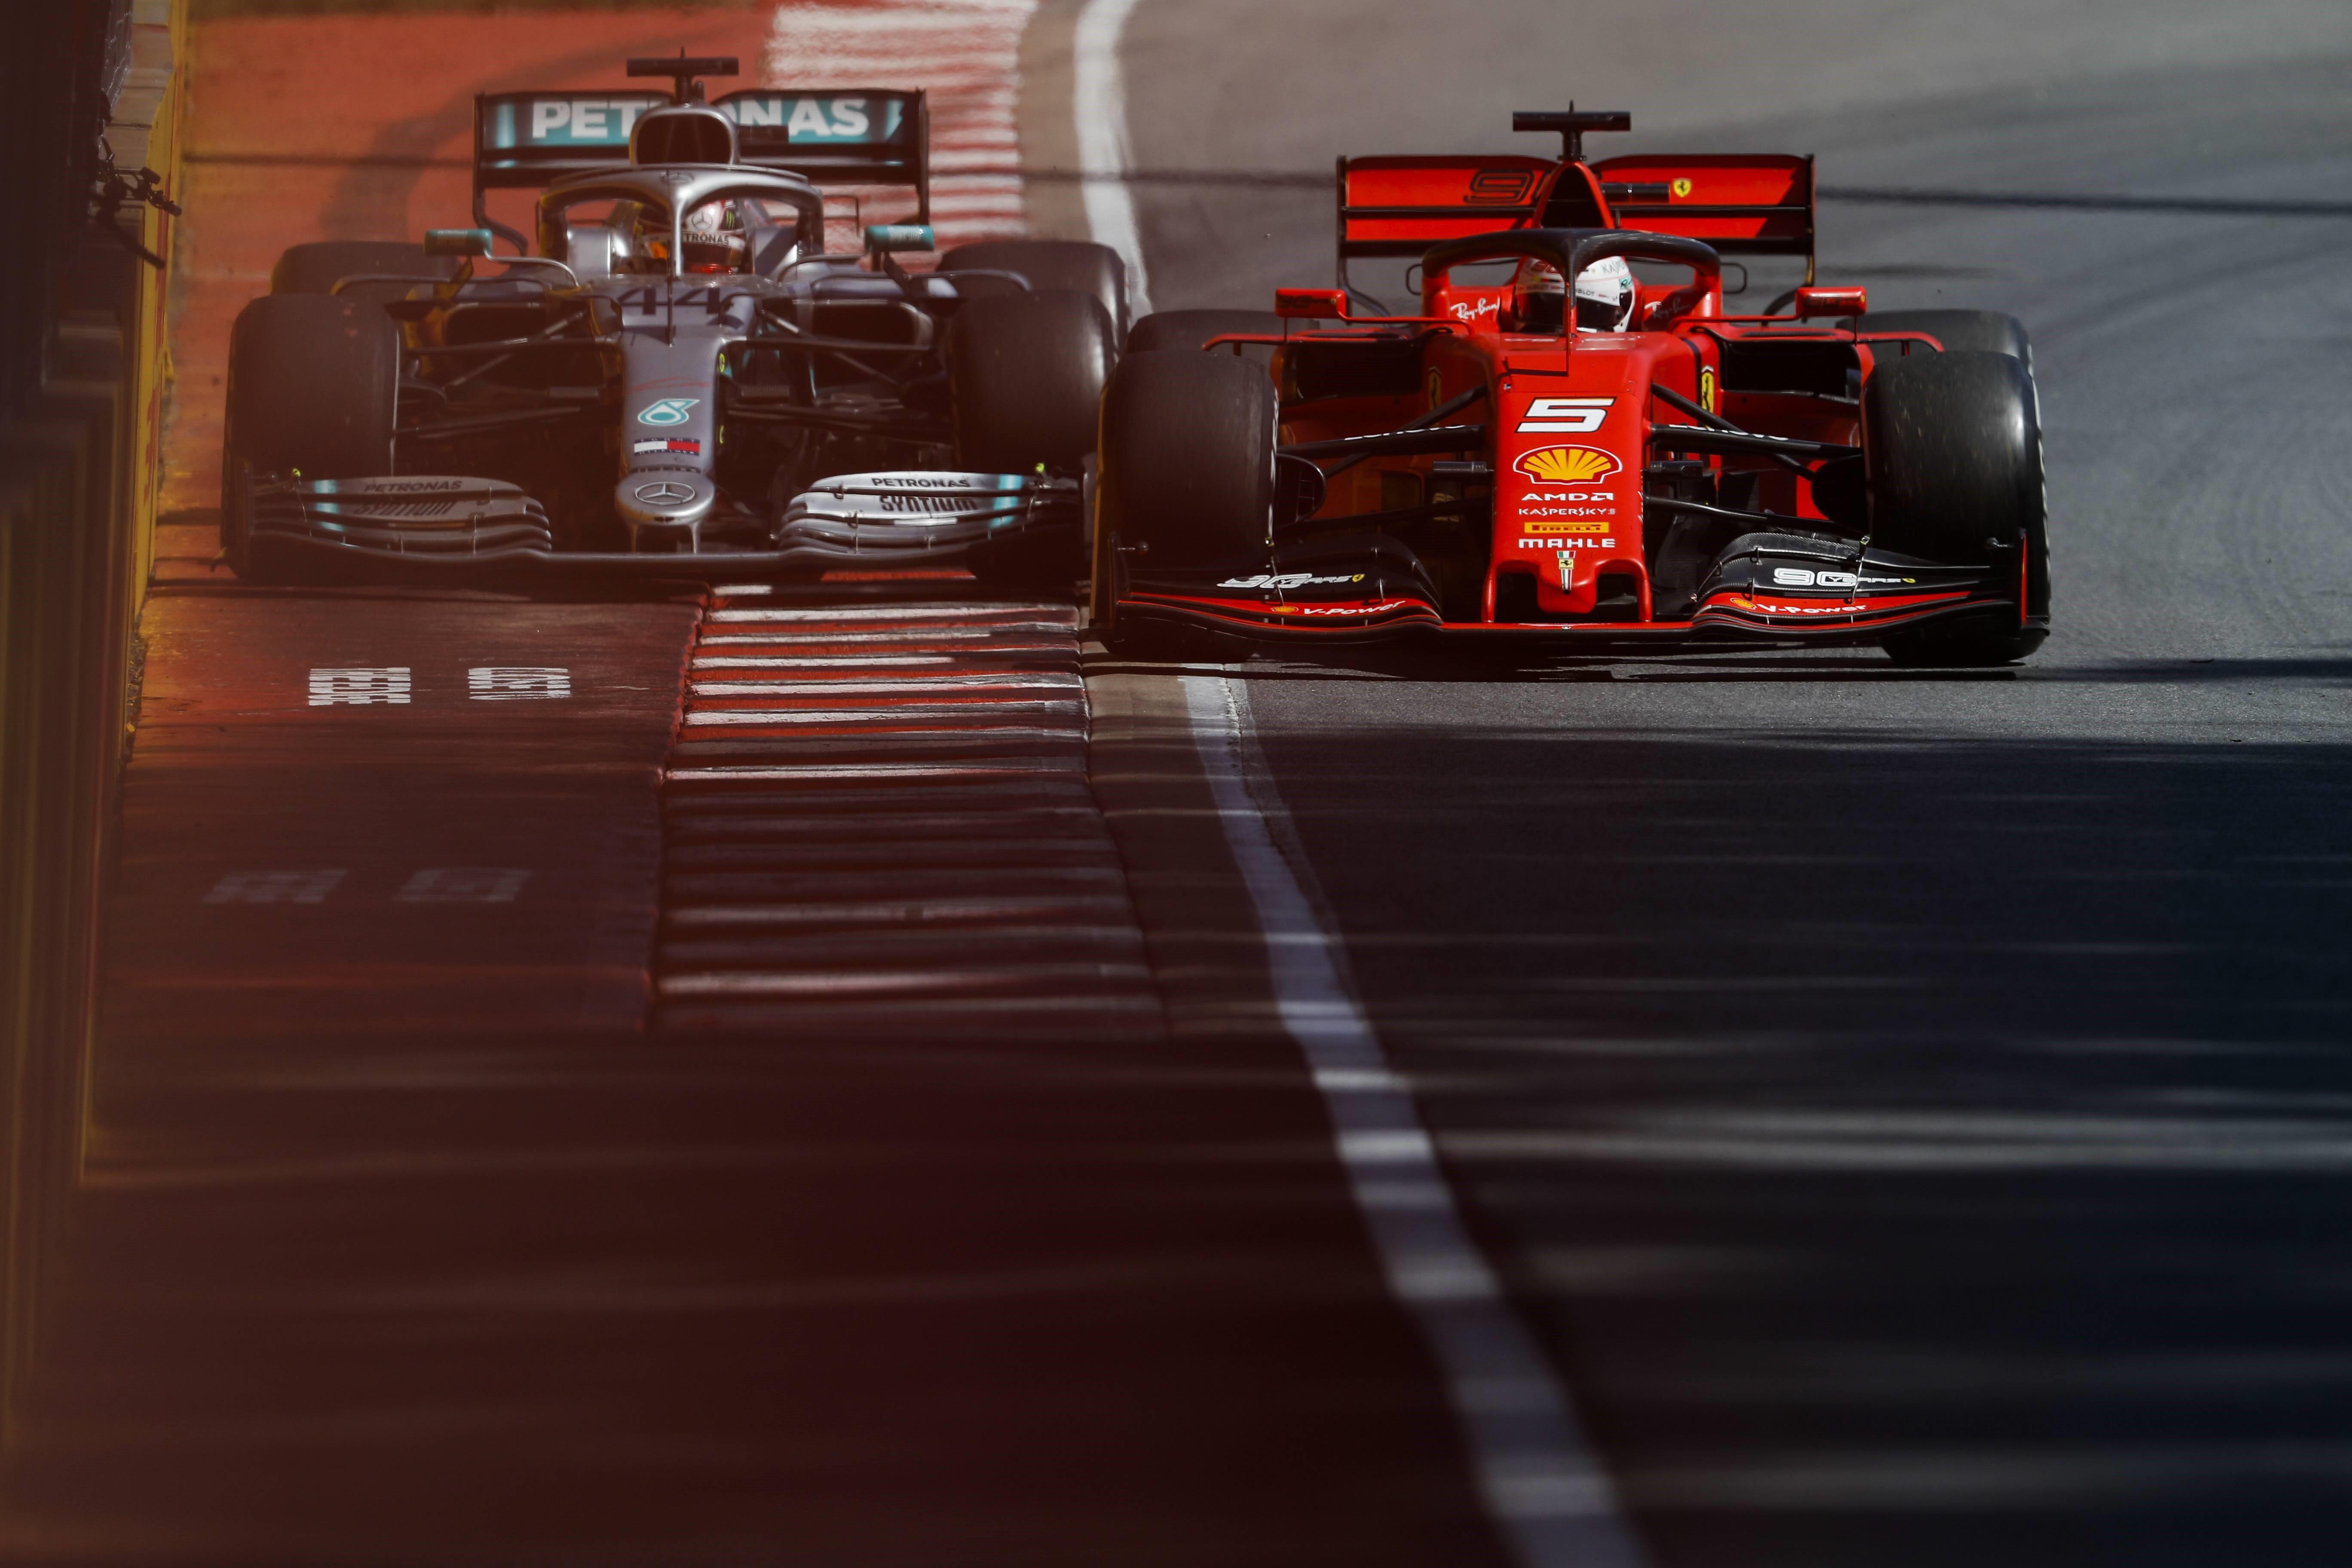 Sebastian Vettel (Ferrari) et Lewis Hamilton (Mercedes) aux 24 Heures du Mans 2019